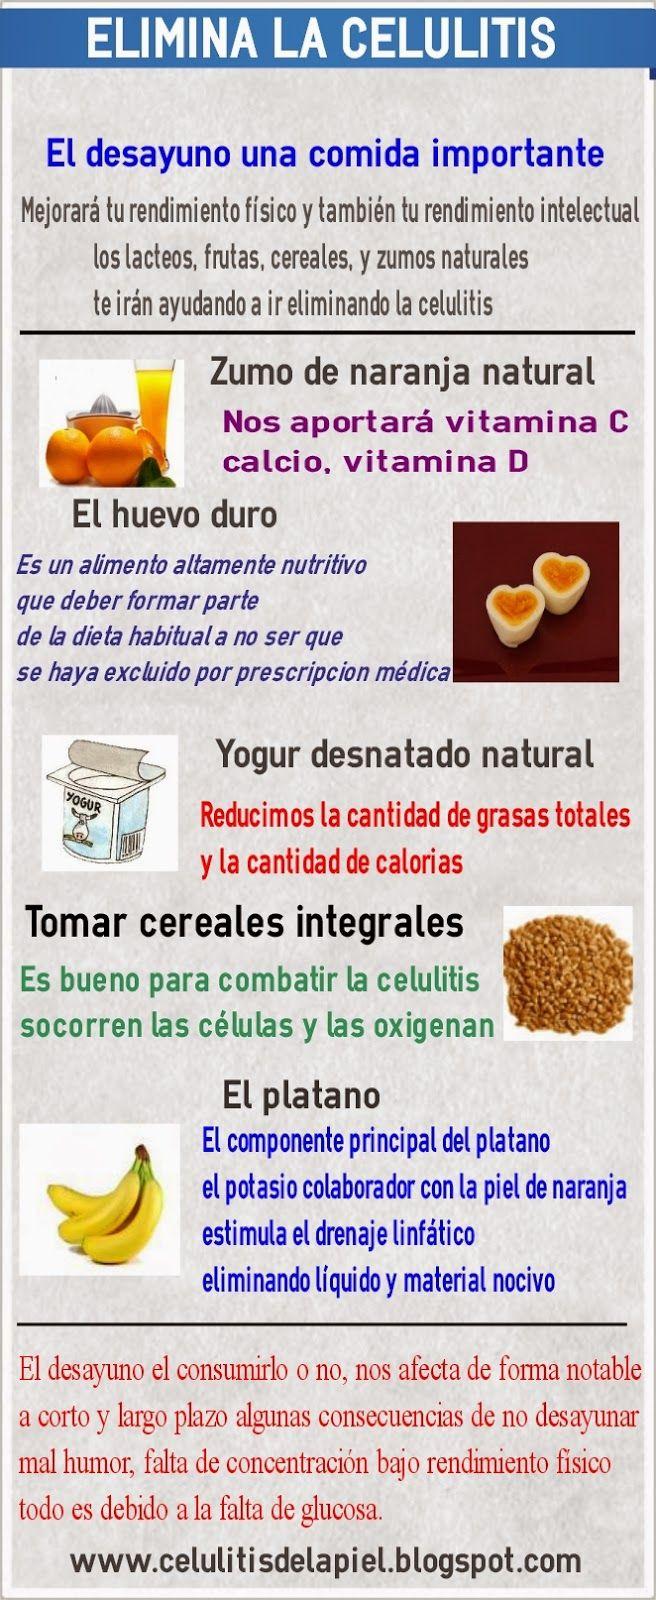 REMEDIOS NATURALES A LA CELULITIS Y MUCHO MAS: Elimina la celulitis con un simple desayuno http://mejoresremediosnaturales.blogspot.com/ #remedios #naturales #popular #caseros